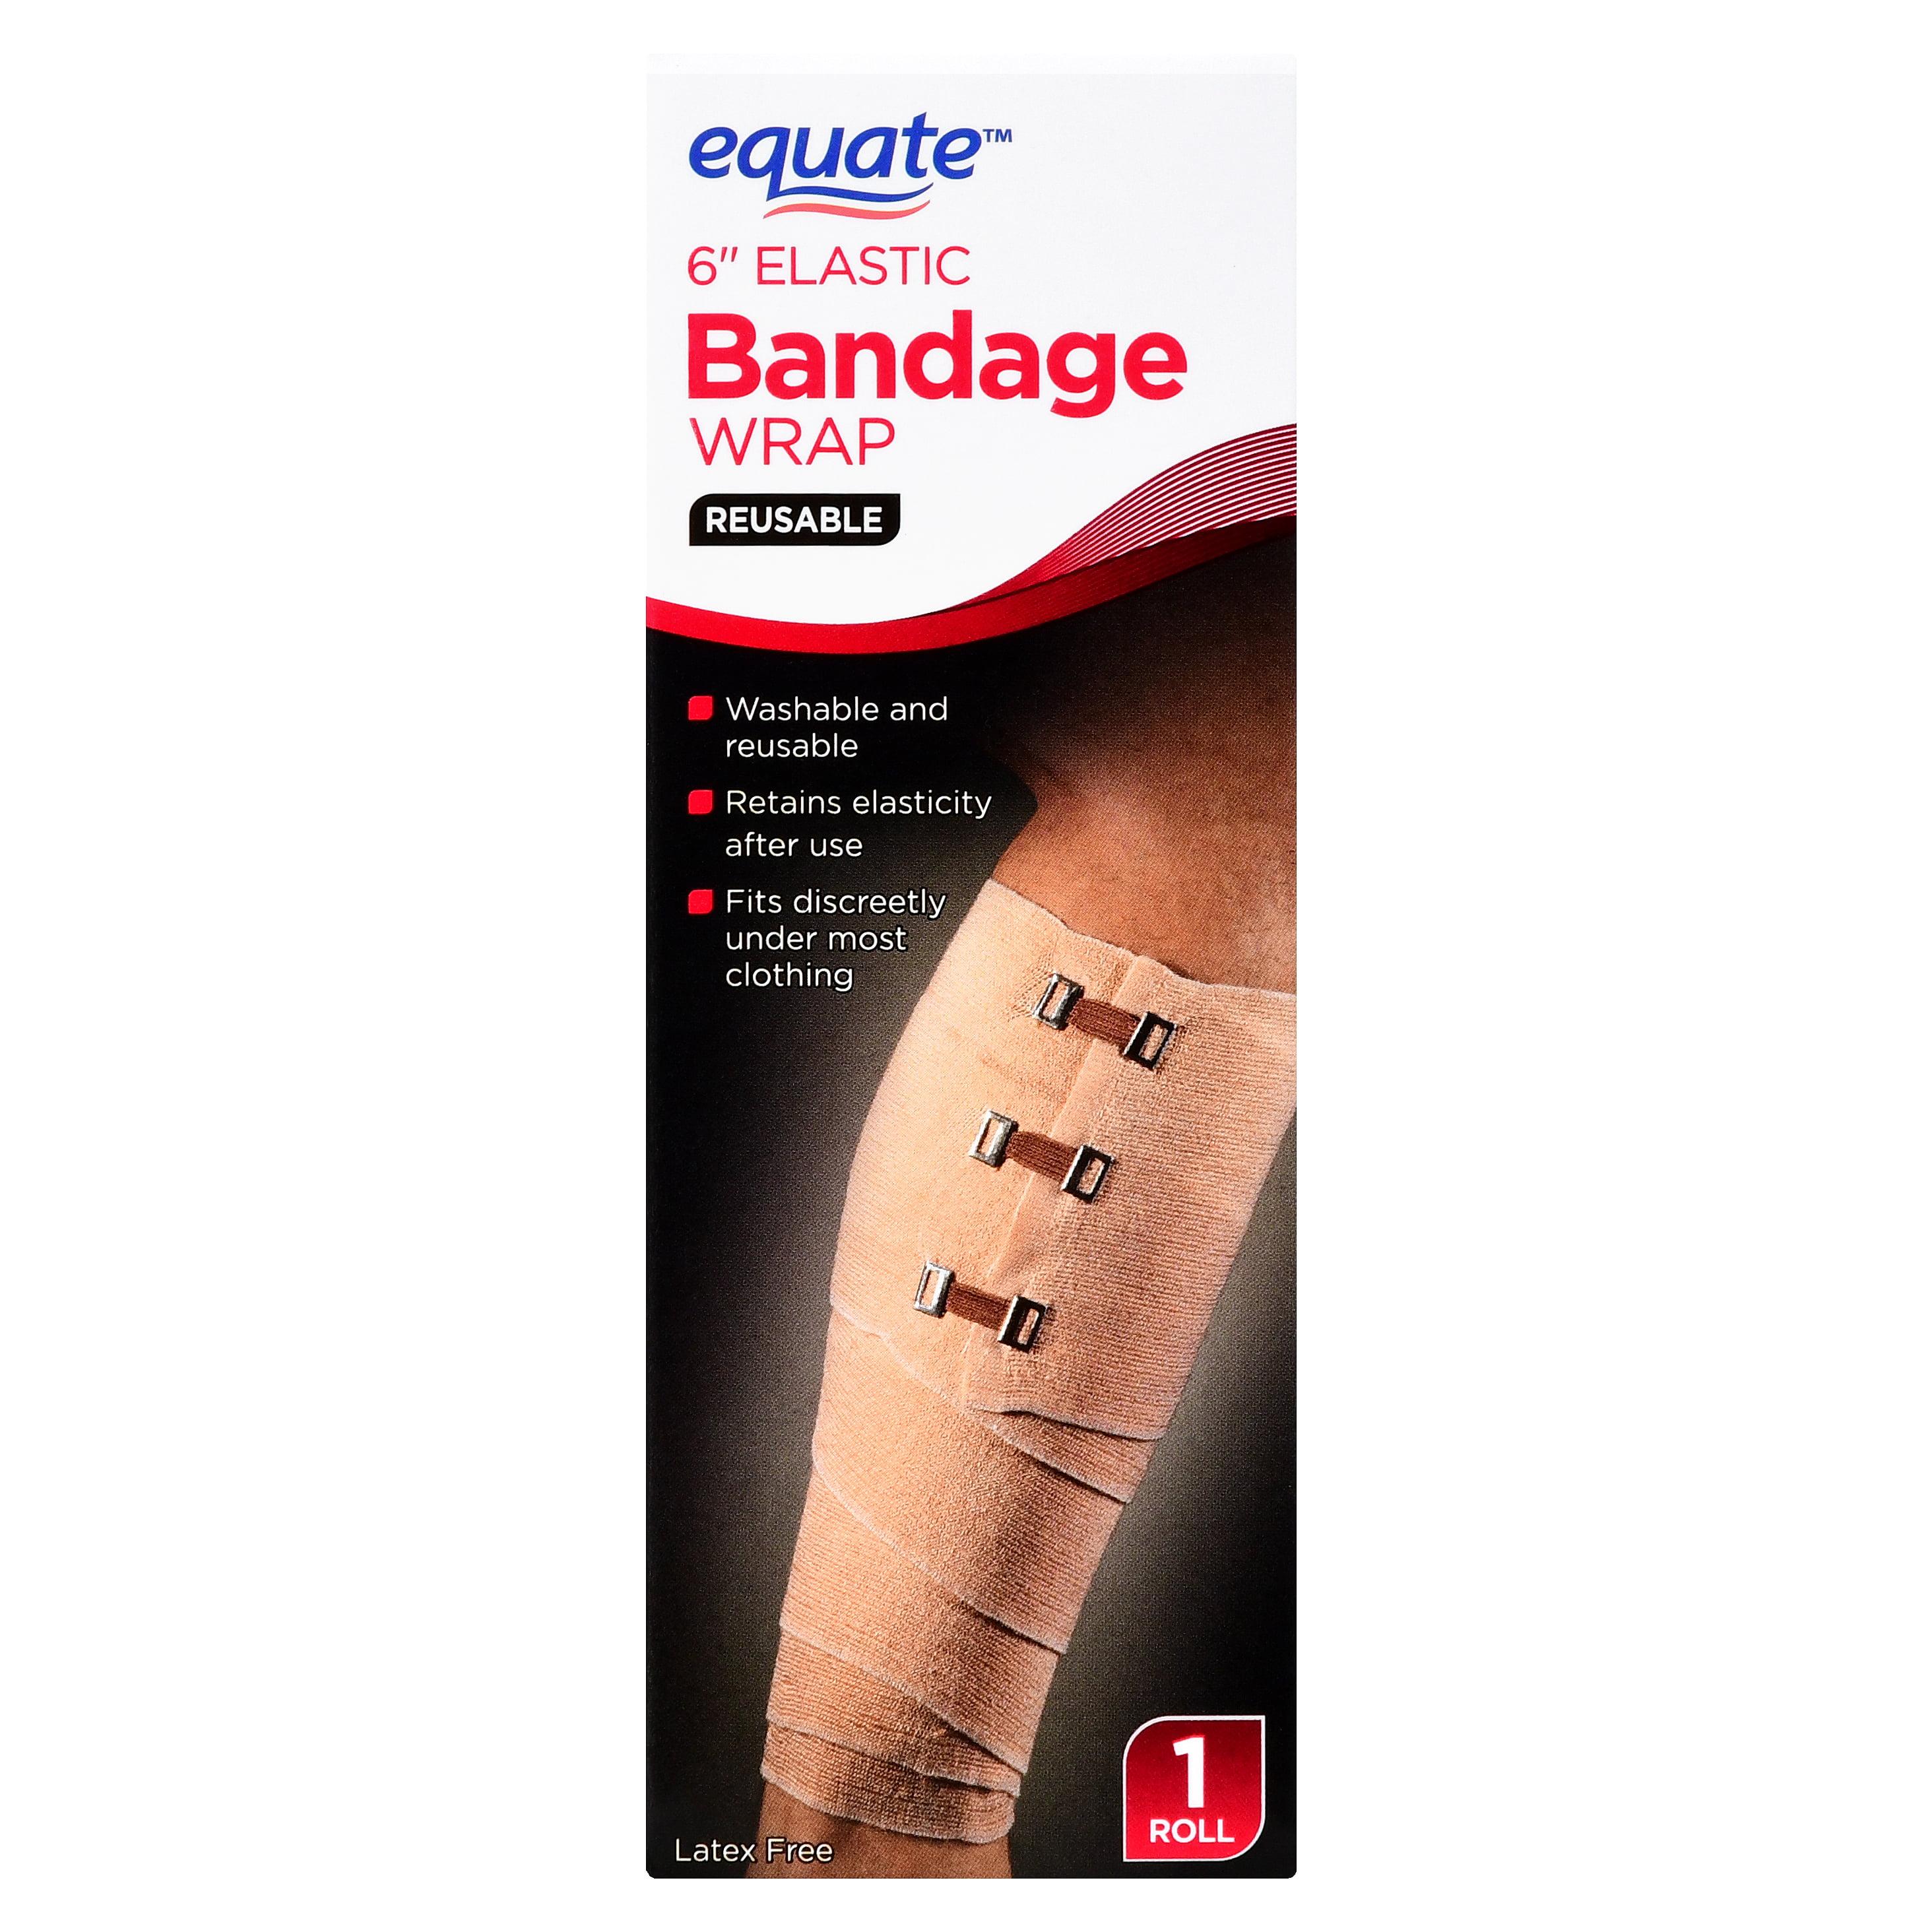 "Equate Reusable Elastic Bandage Wrap, 6"", 1 Roll"